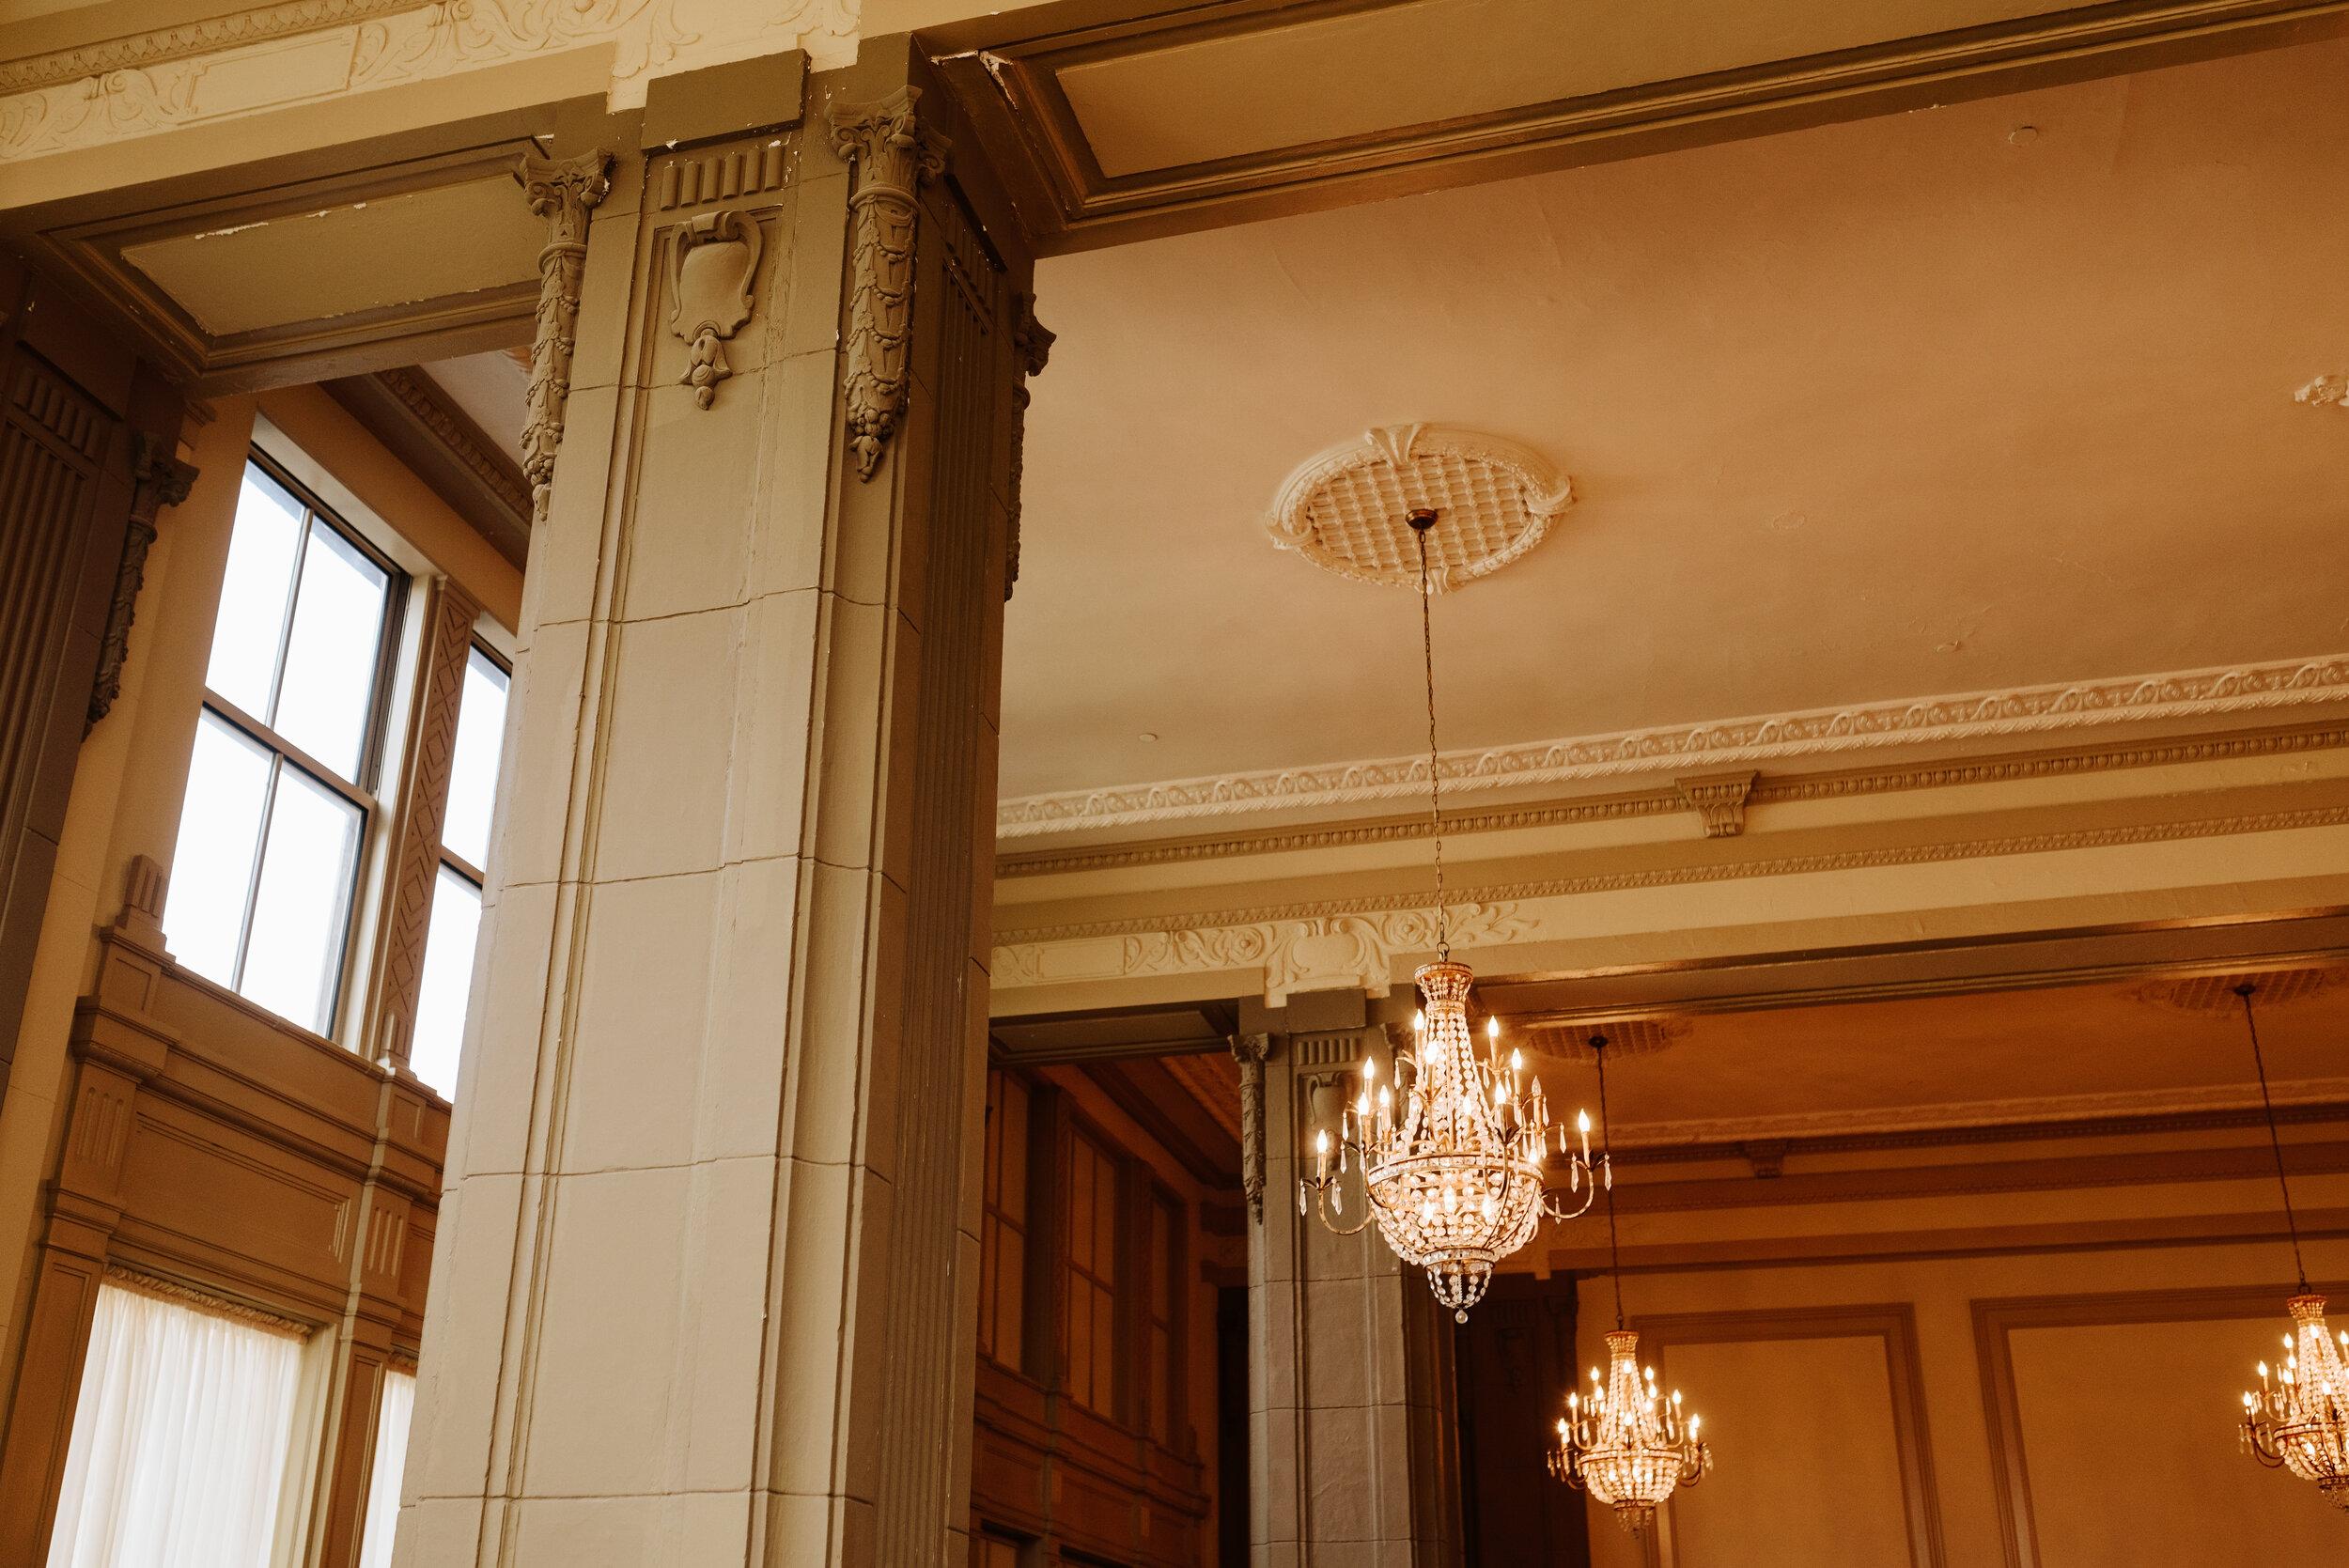 Cassie-Mrunal-Wedding-Quirk-Hotel-John-Marshall-Ballrooms-Richmond-Virginia-Photography-by-V-61.jpg